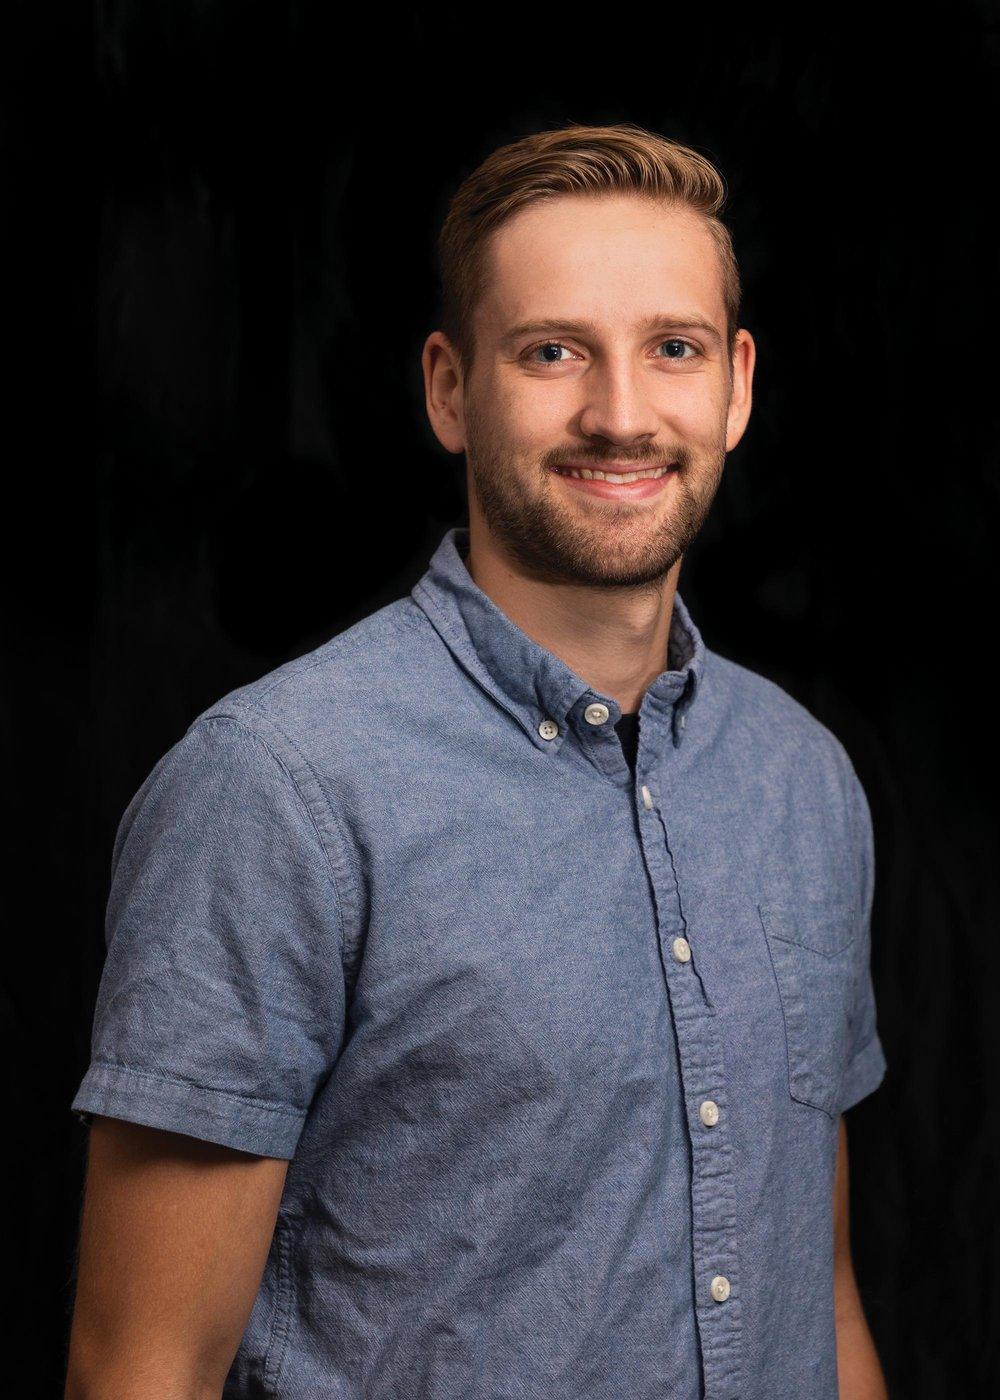 Jacob Rink - Creative Director